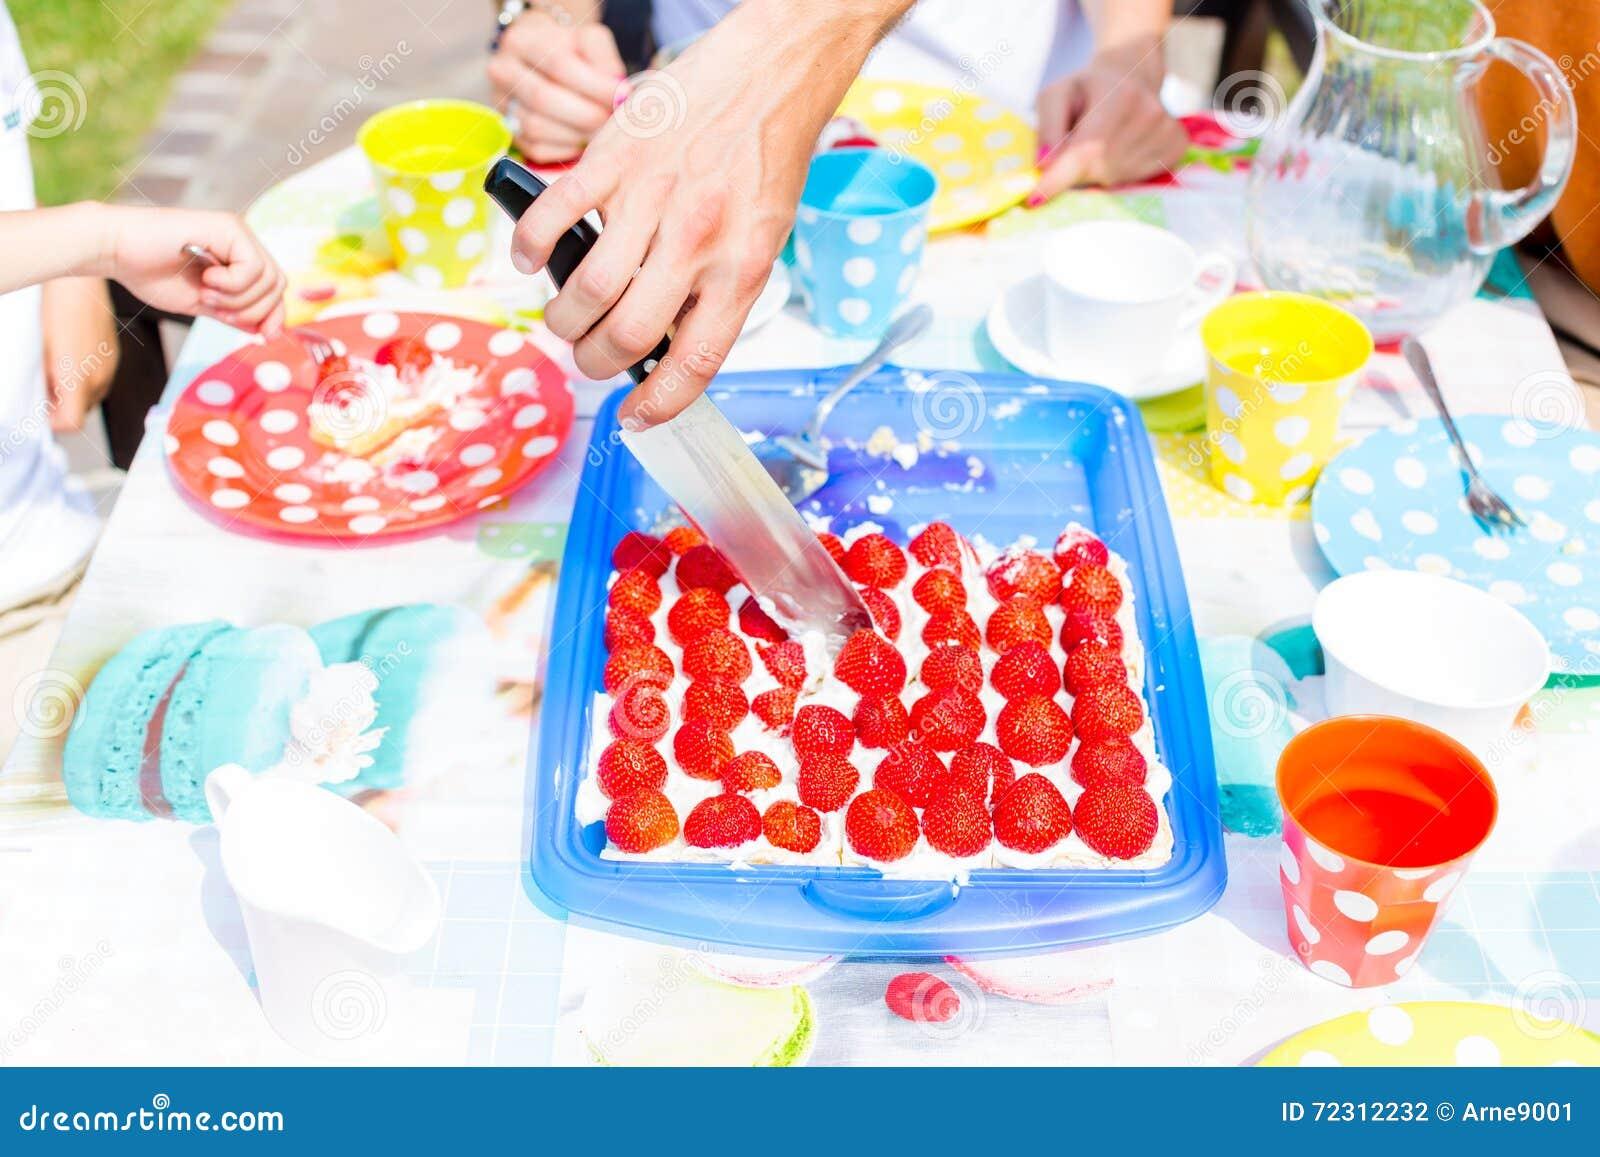 Birthday Cake Cutting Knife